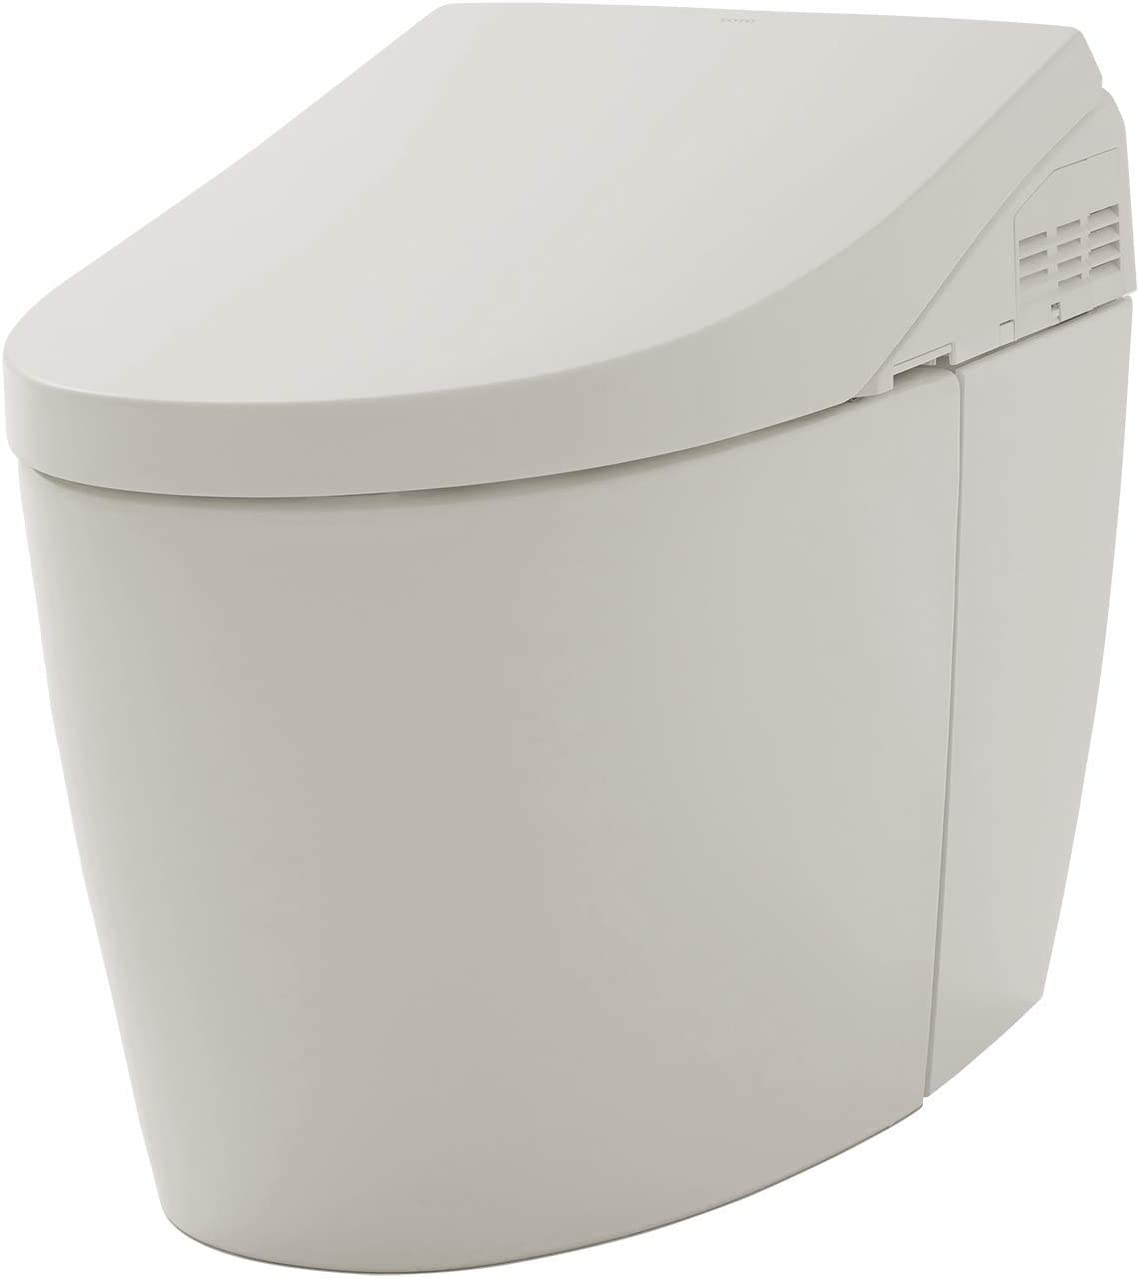 Toto Ms989cumfg 12 Neorest Ah Dual Flush 1 0 Or 0 8 Gpf Toilet